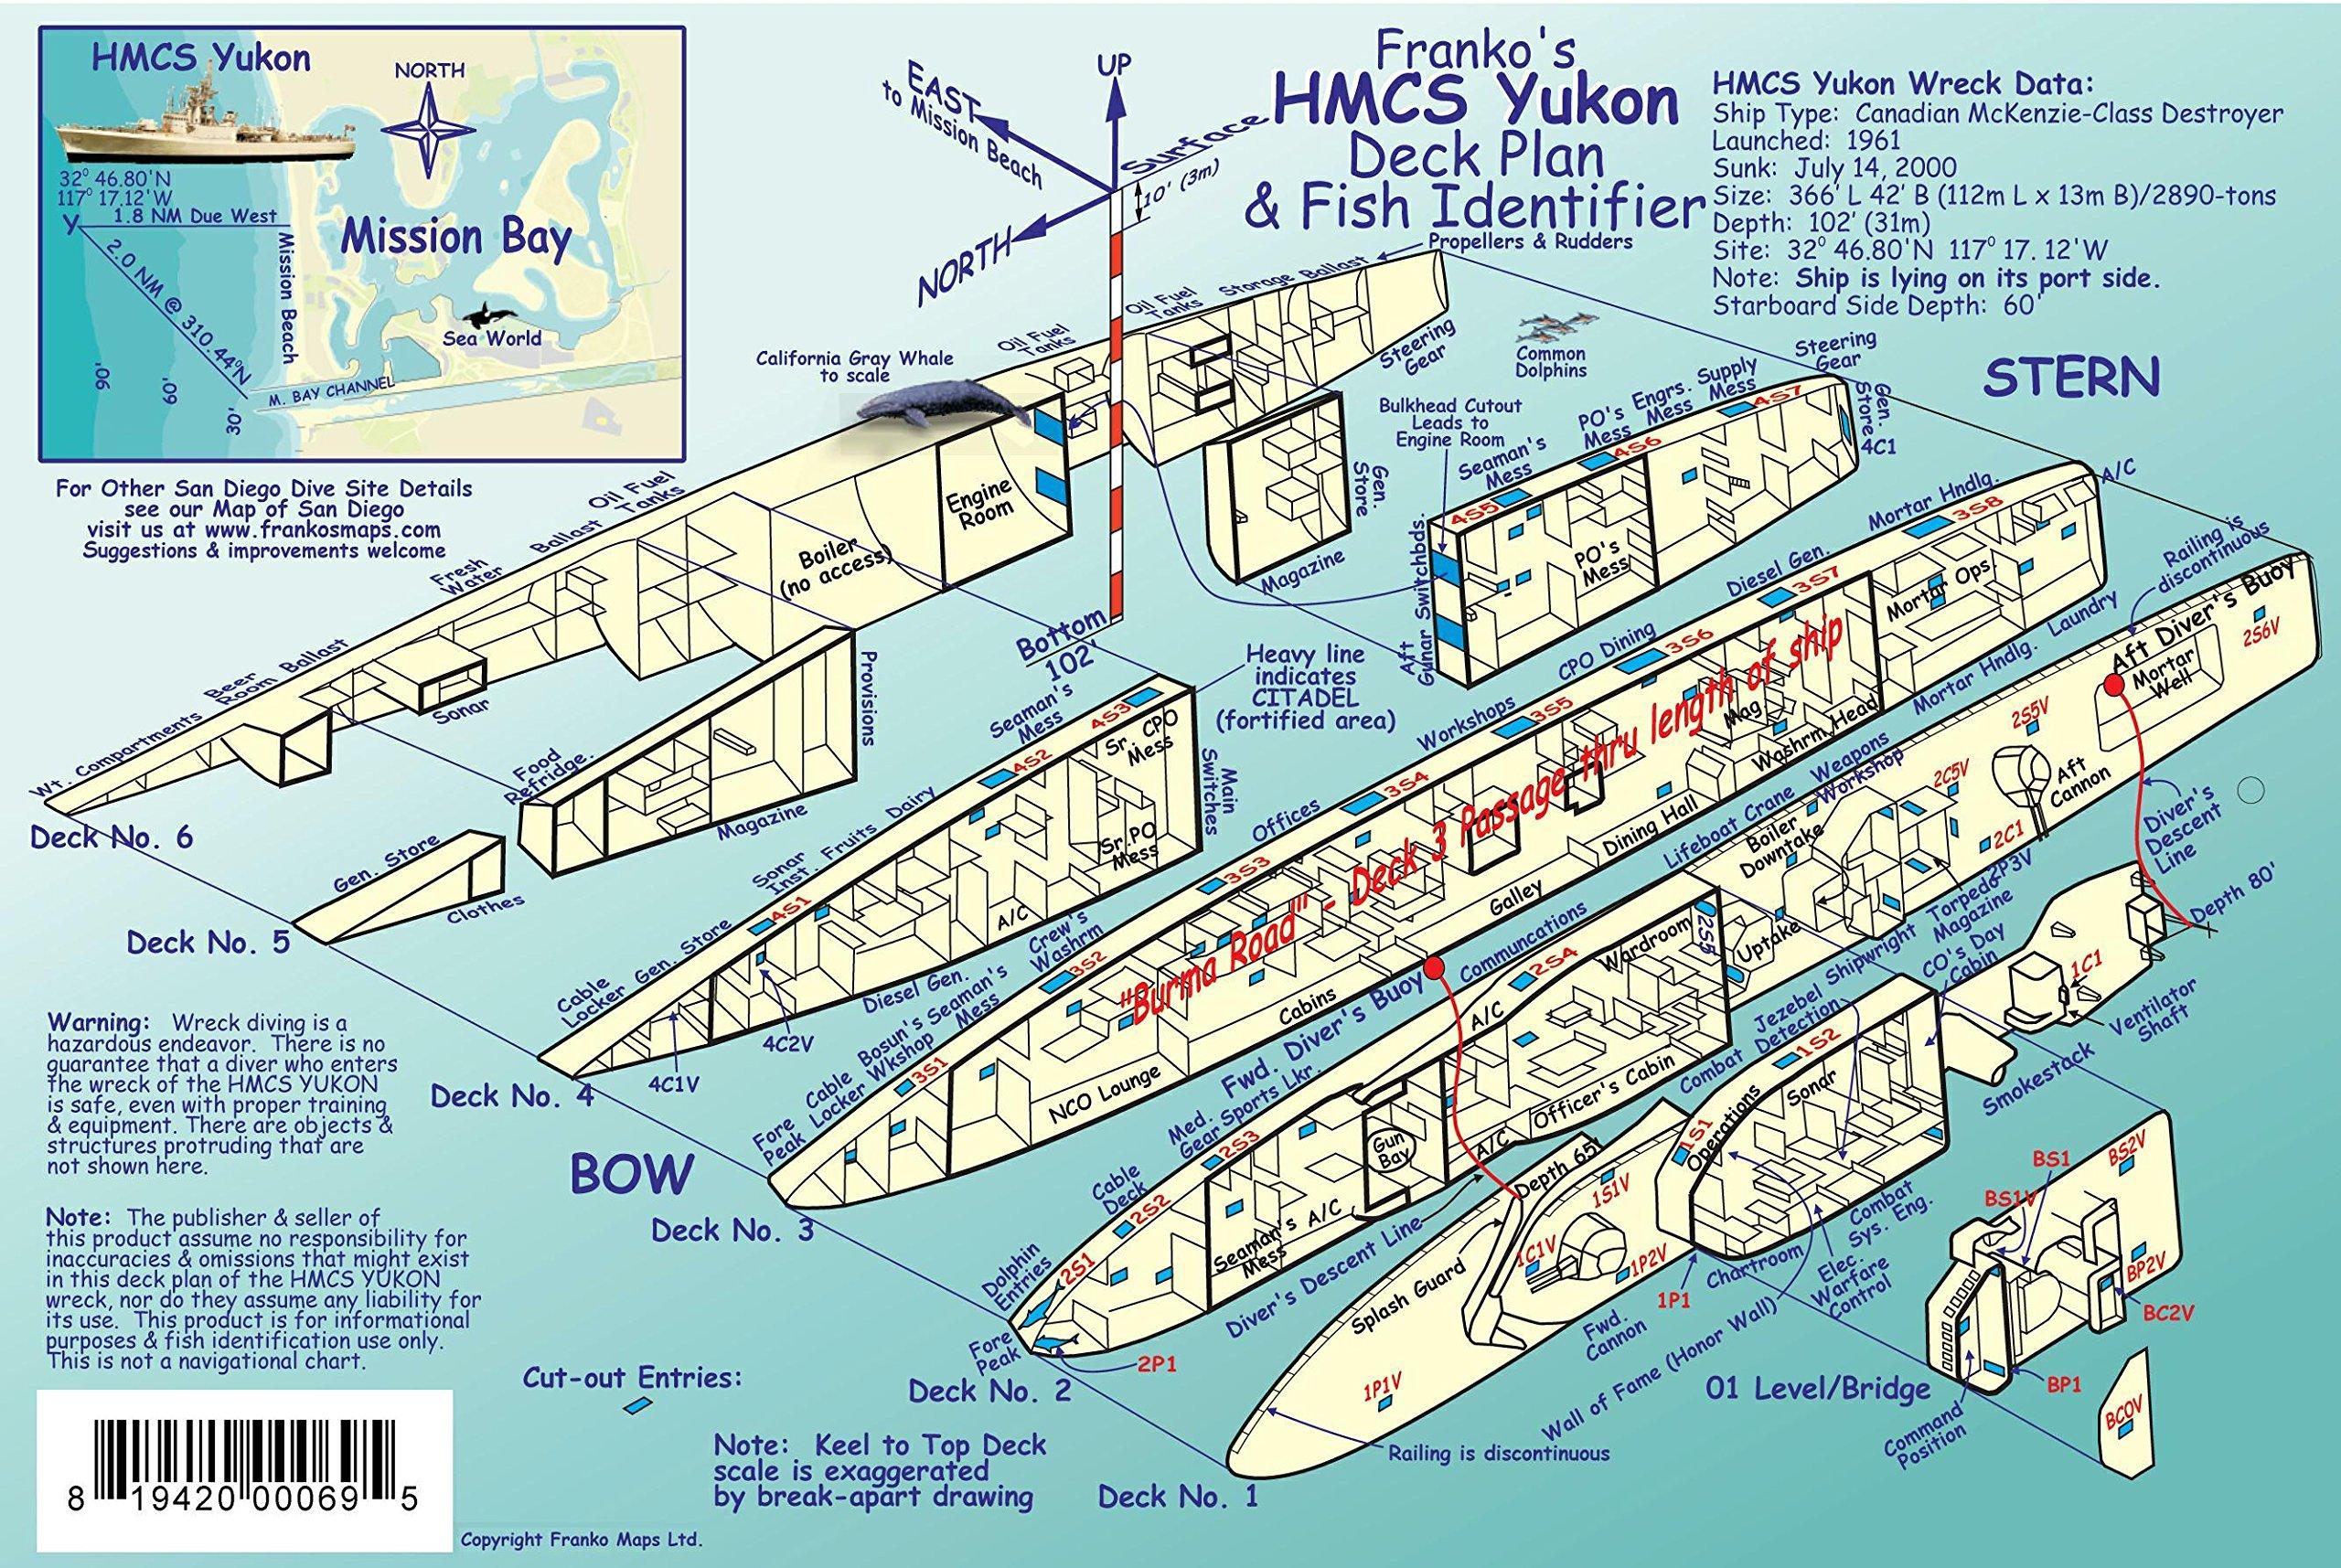 HMCS Yukon Wreck Deck Plan & San Diego Kelp Forest Creatures Guide